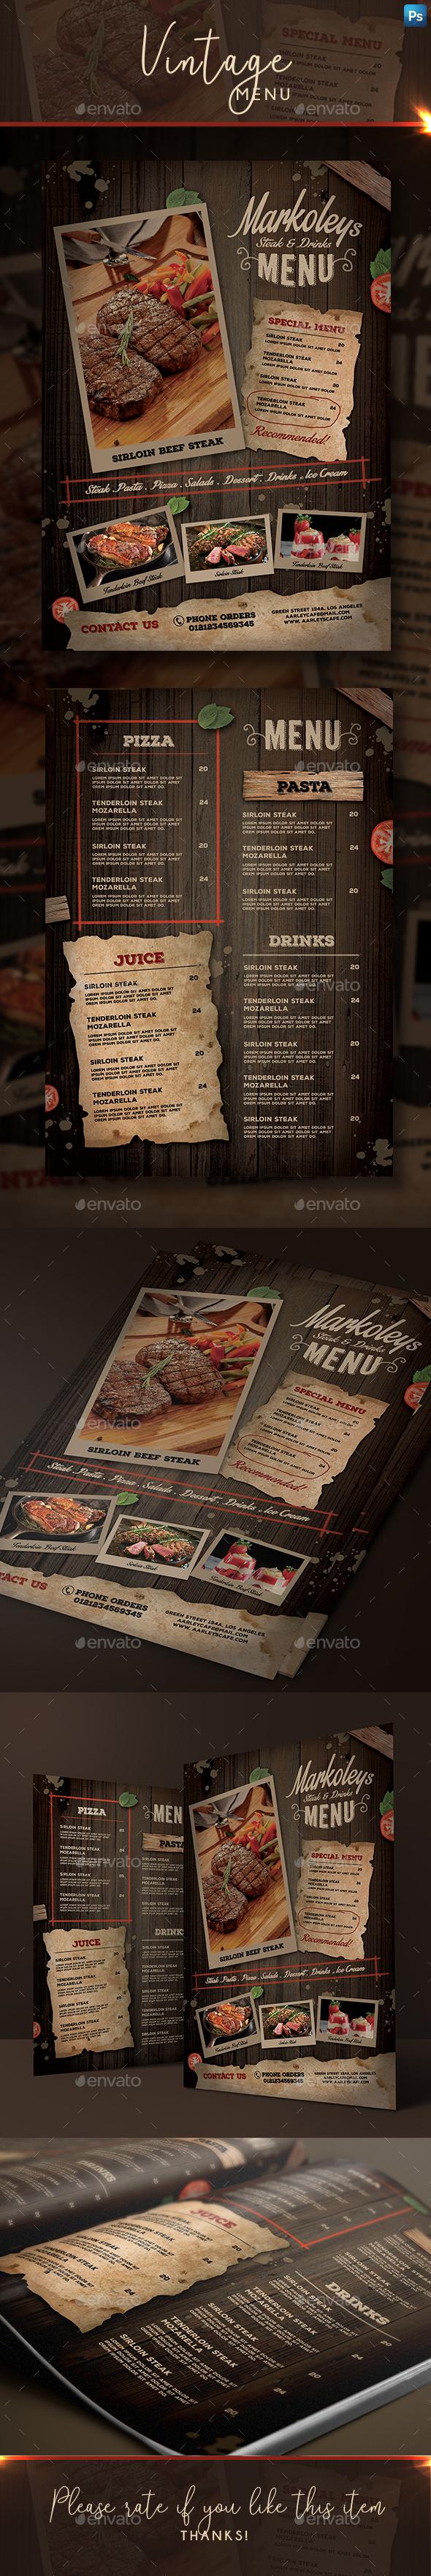 Rustic Cafe Menu